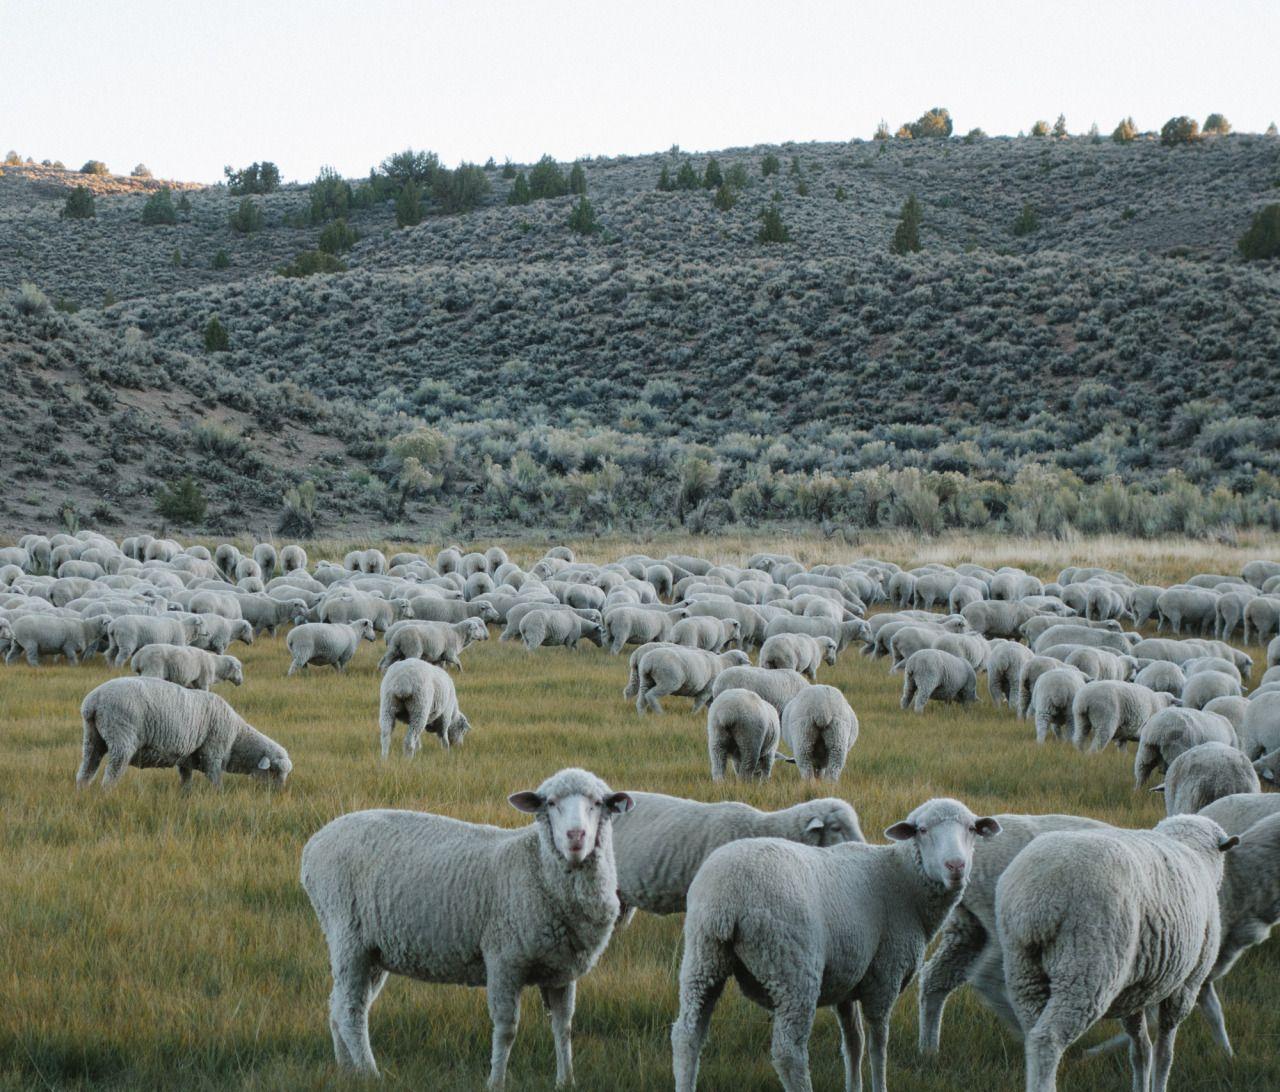 Sheep, Bodie, CA